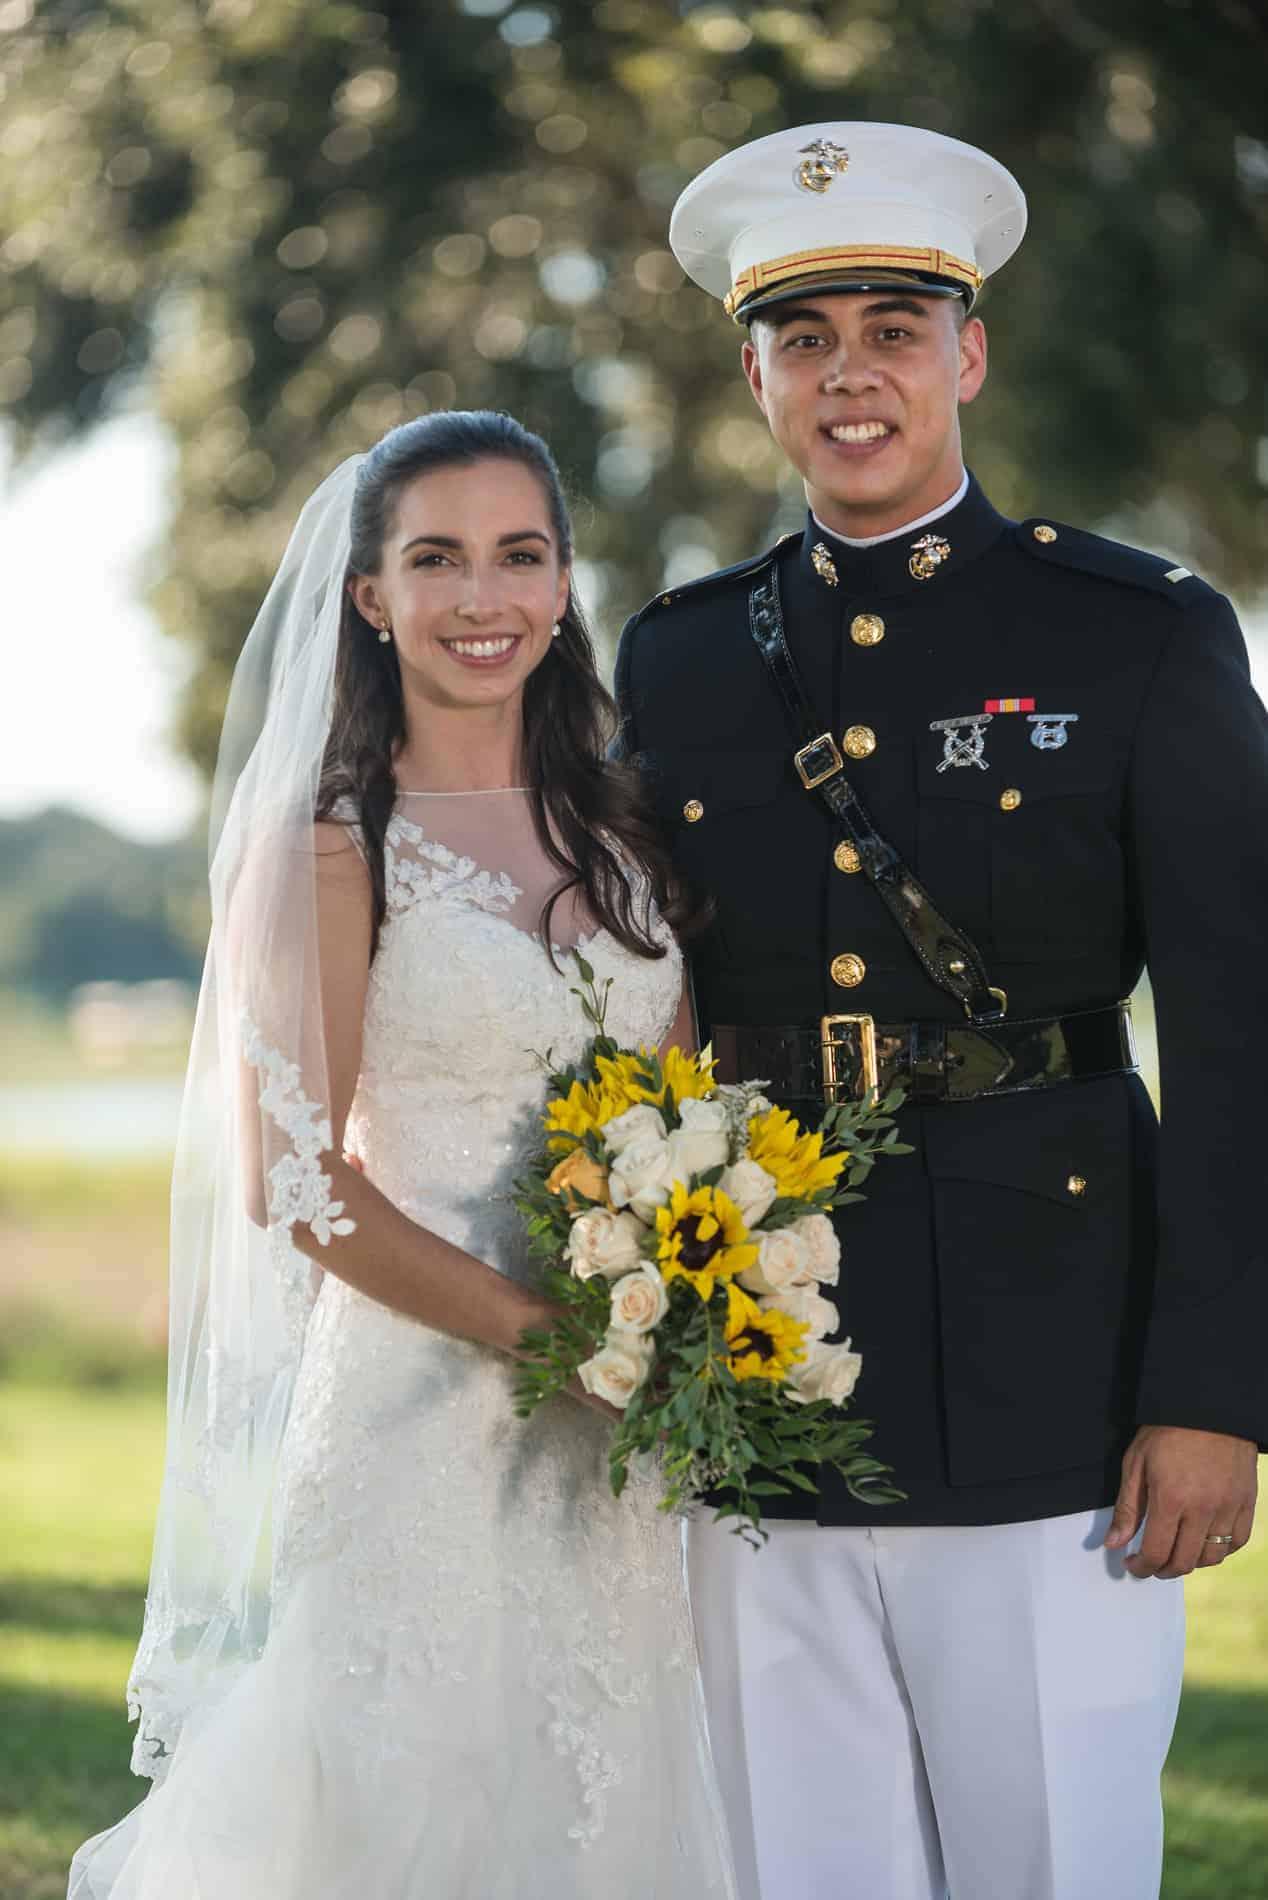 Overtime for Wedding Vendors at a Wonderful Orlando Military Wedding